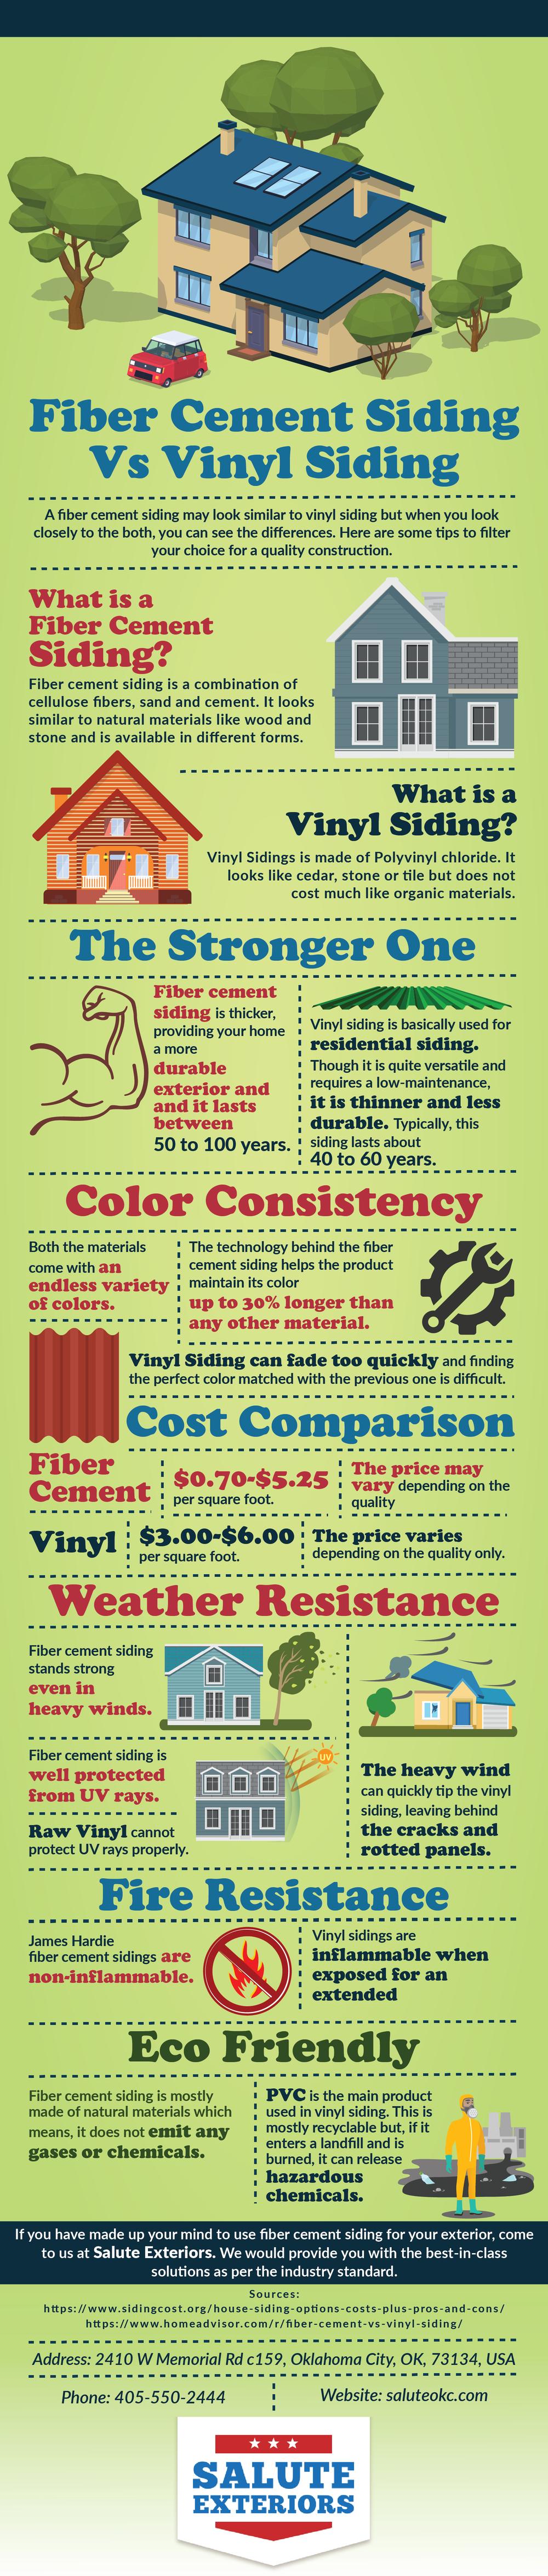 Salute Exterior_James Hardie siding Oklahoma City_Infographic.png